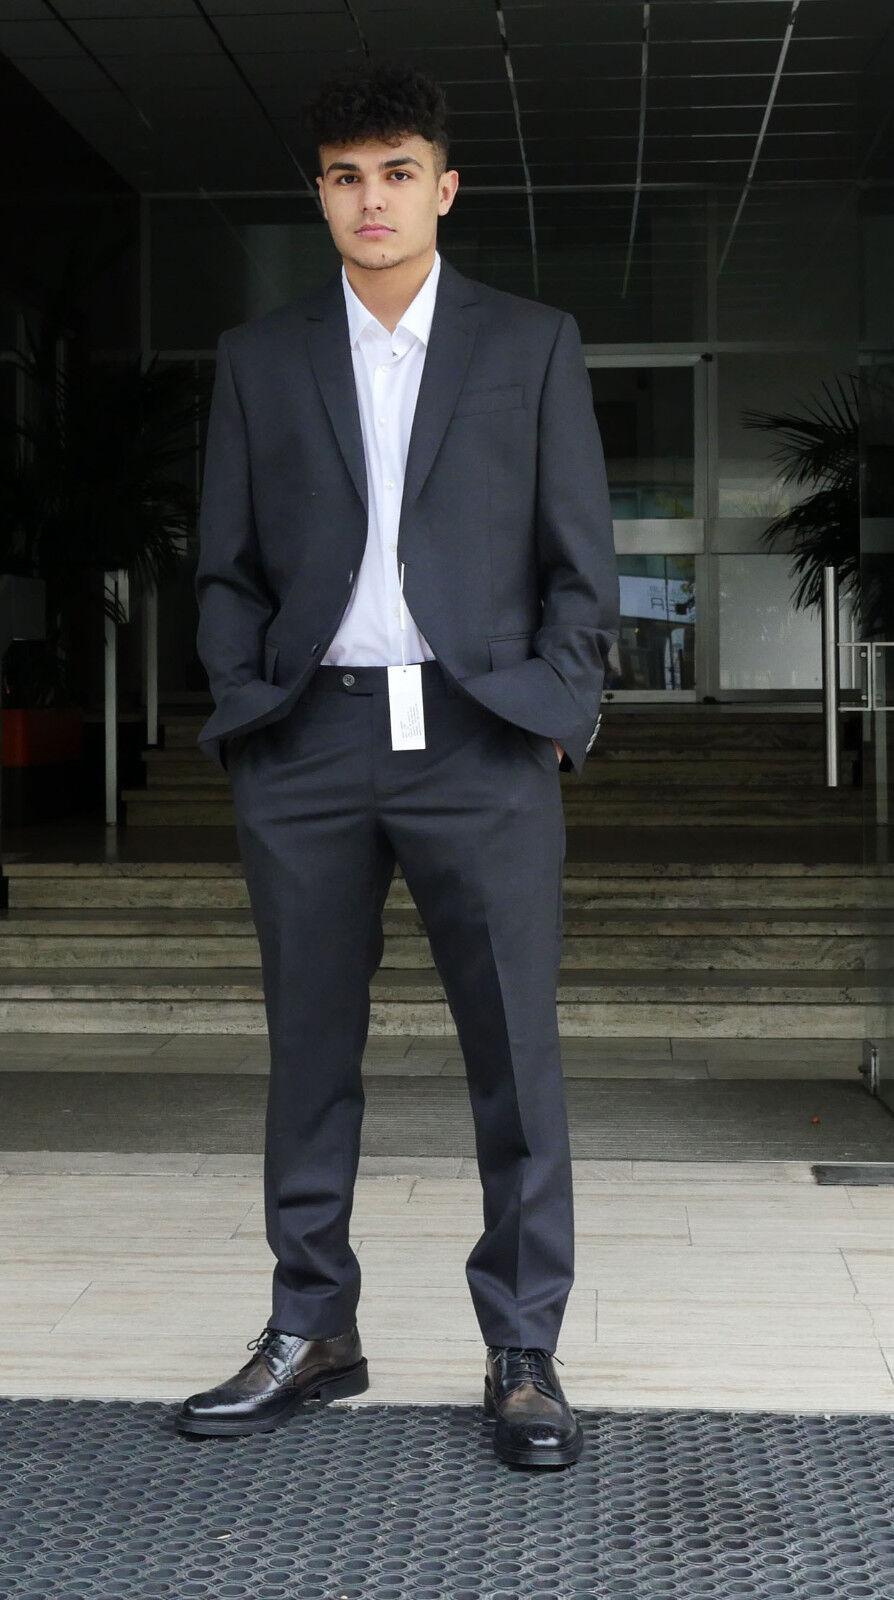 Herren Anzug Pierre BALMAIN 100% Wolle Herren suit wool 52 grau Grau neu new